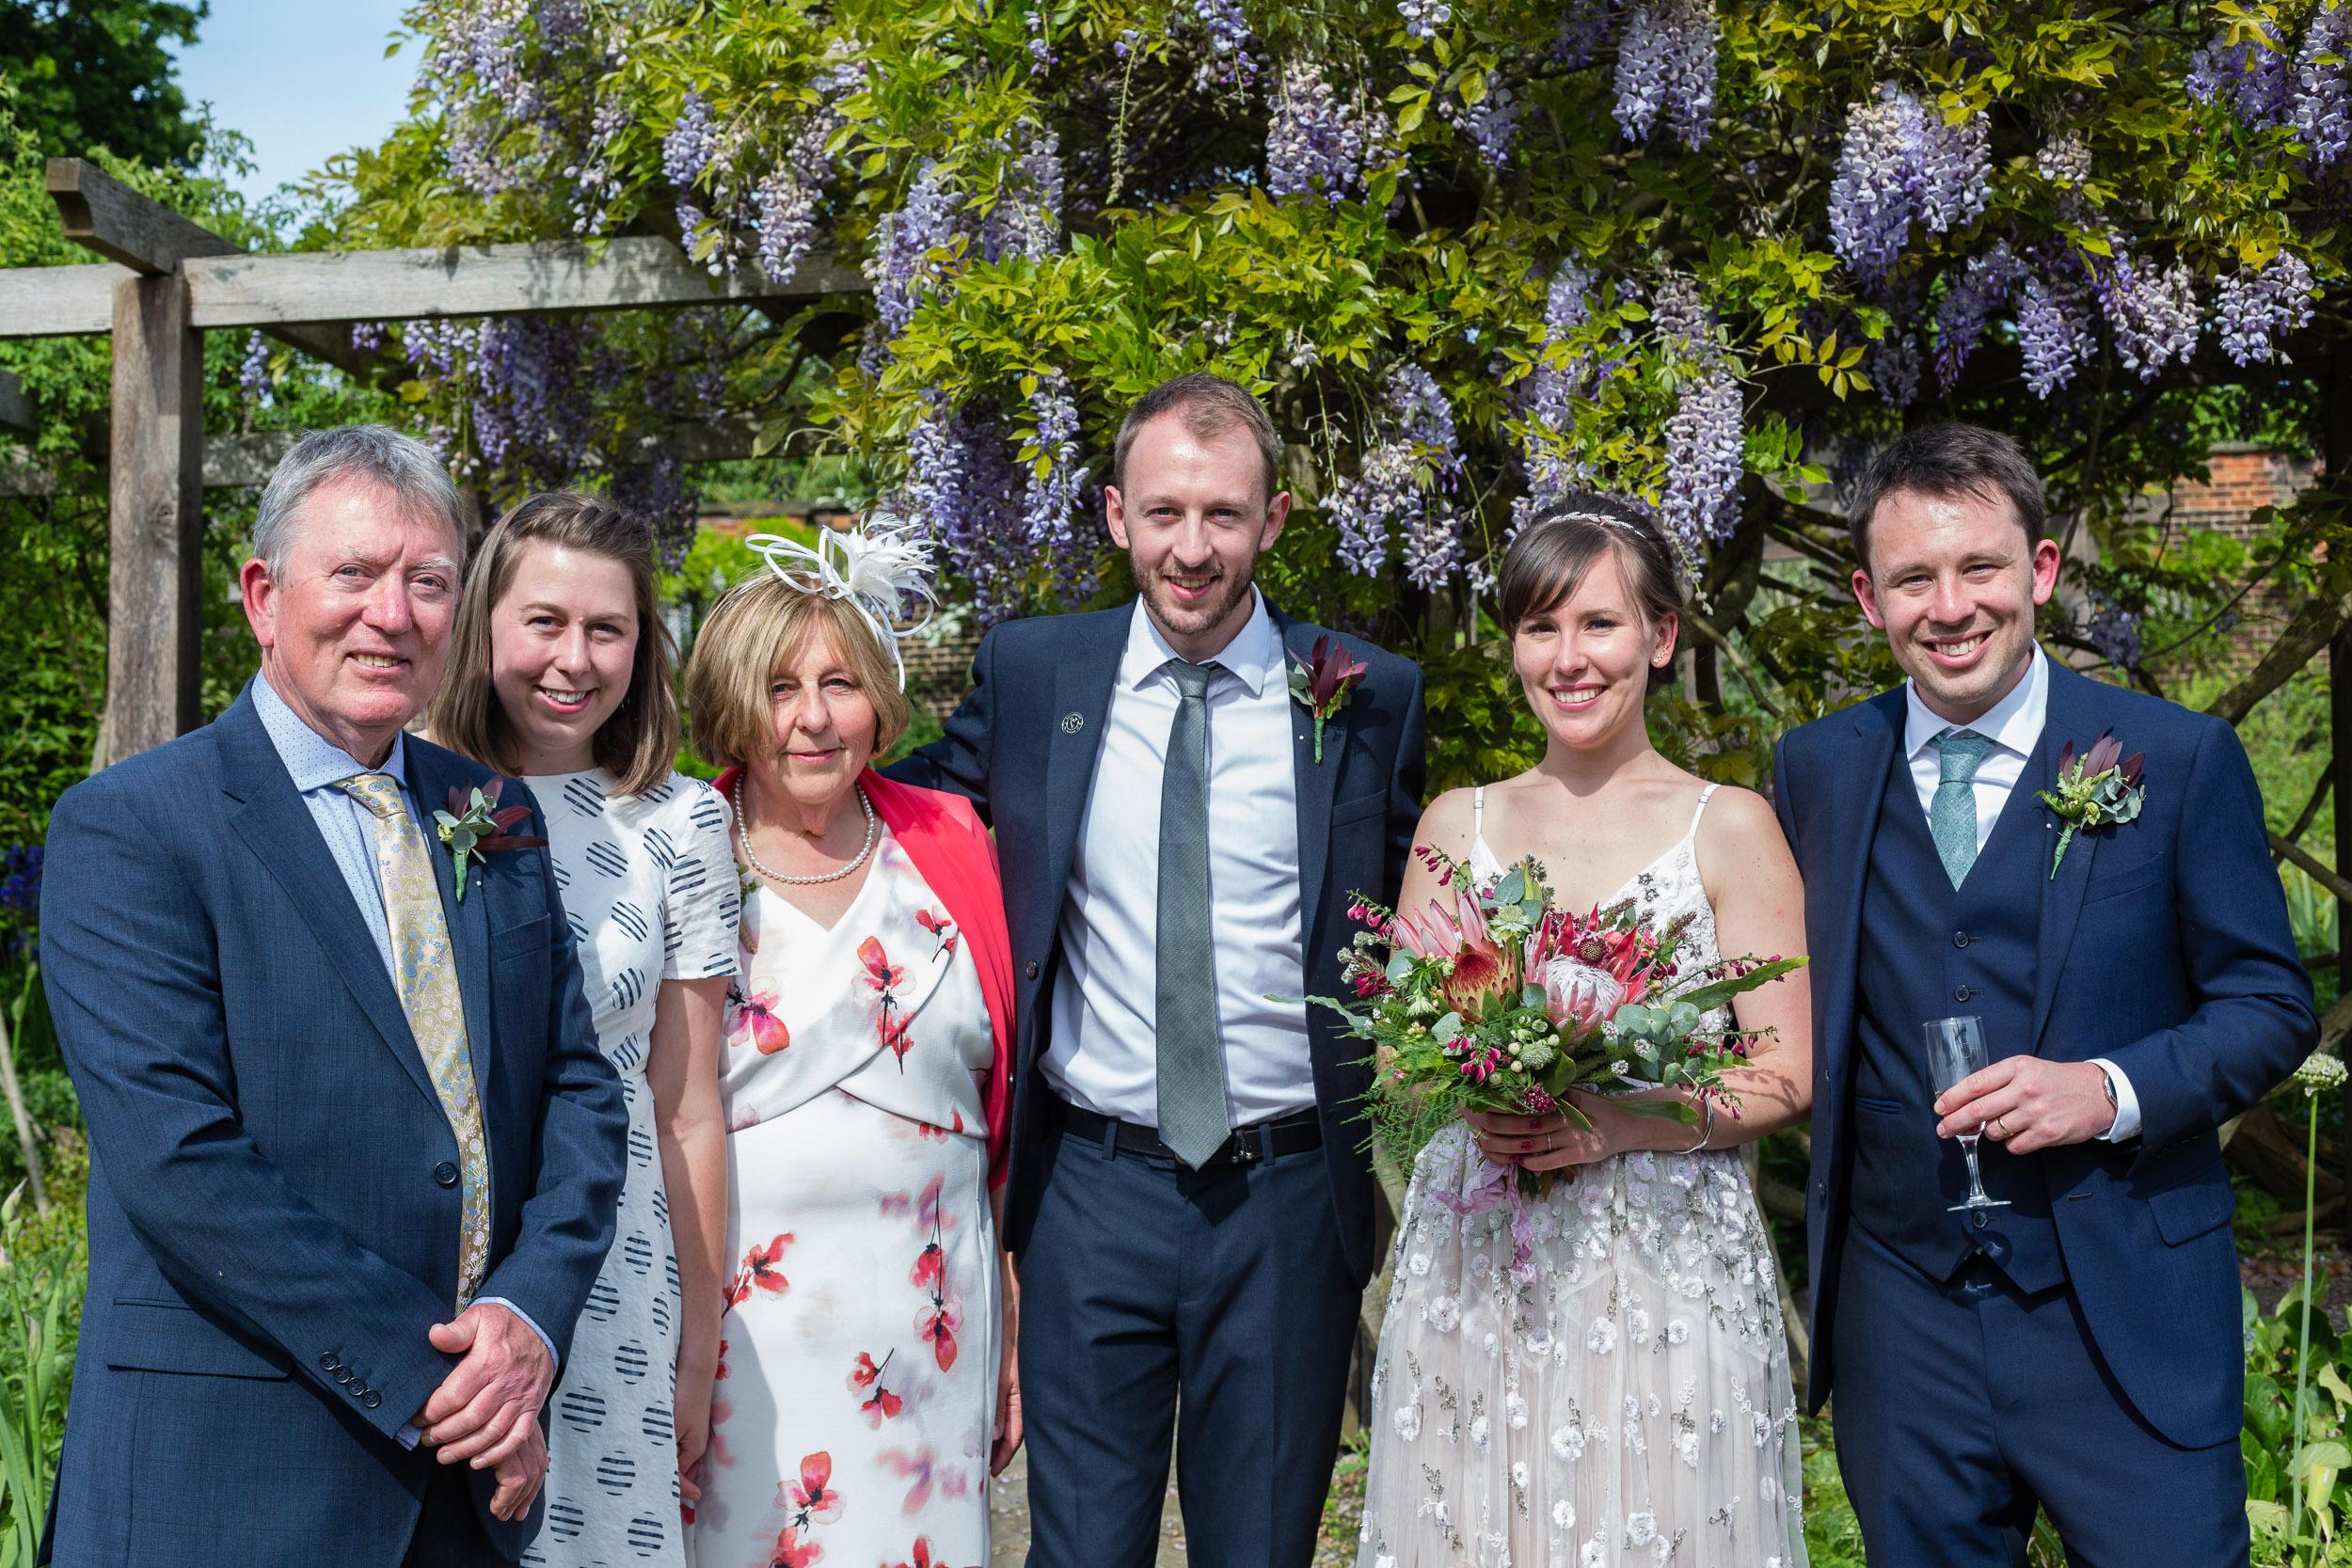 brockwell-lido-brixton-herne-hill-wedding-254.jpg